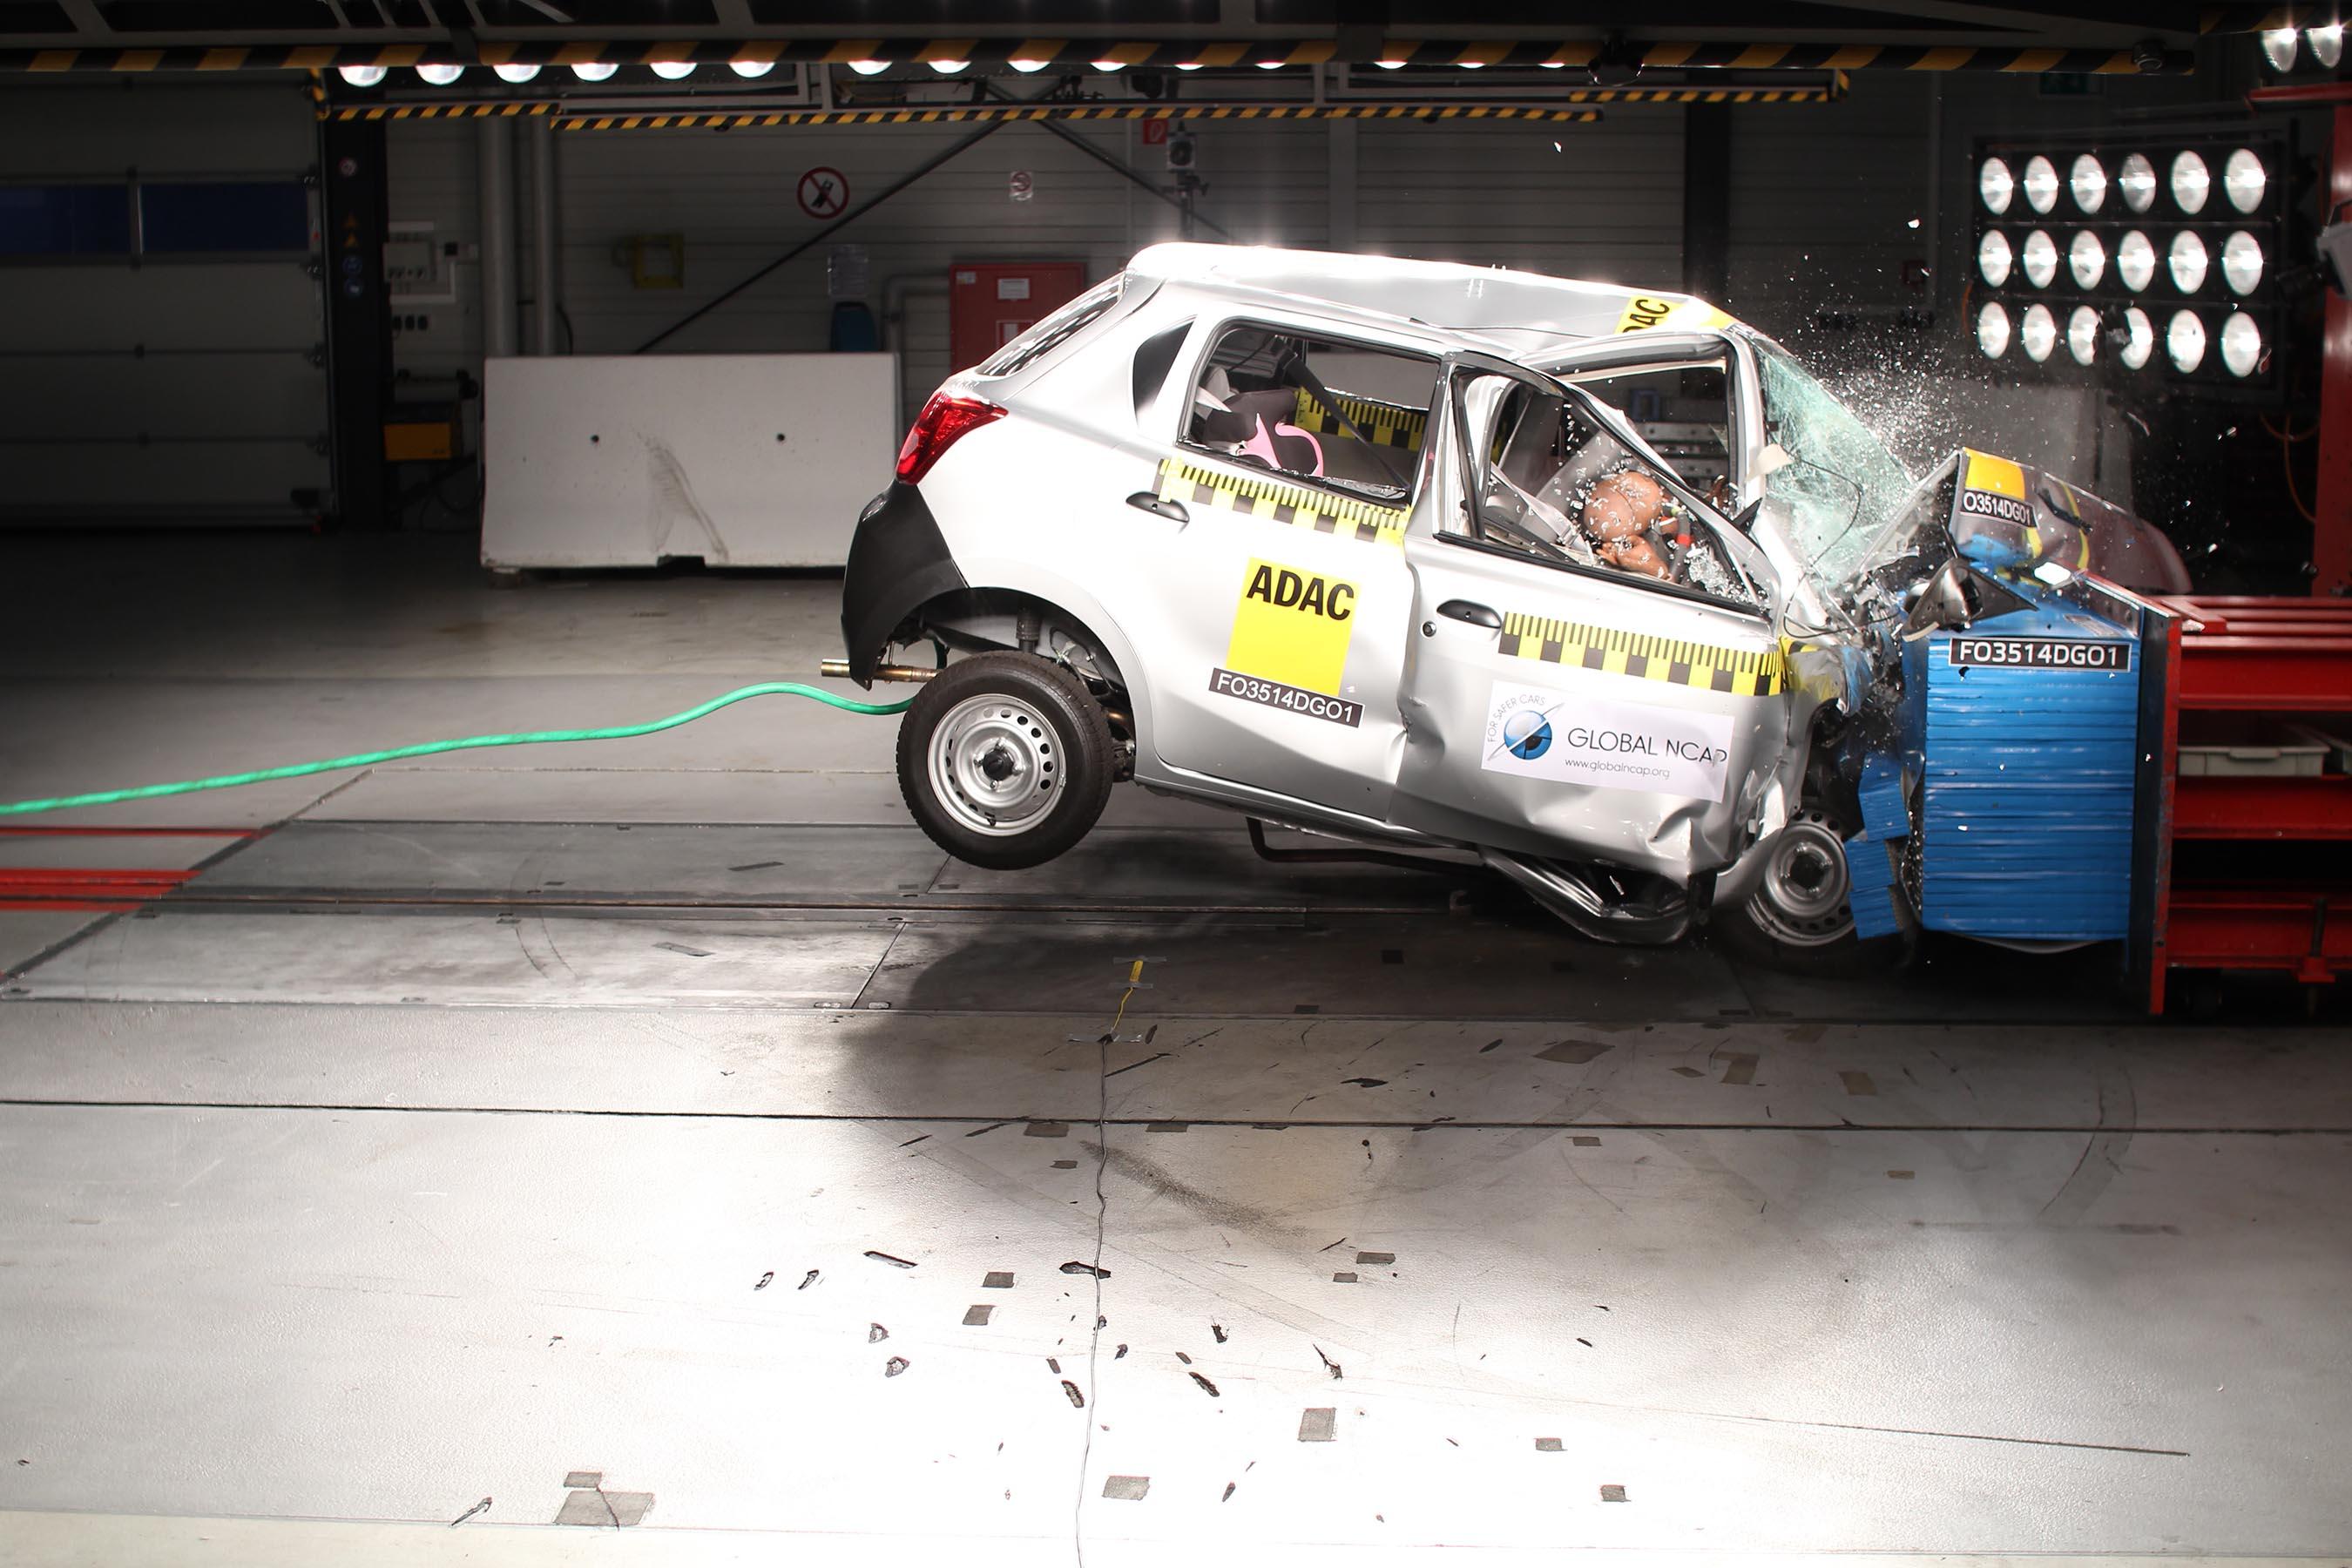 Global Ncap Calls For Urgent Withdrawal Of Datsun Go